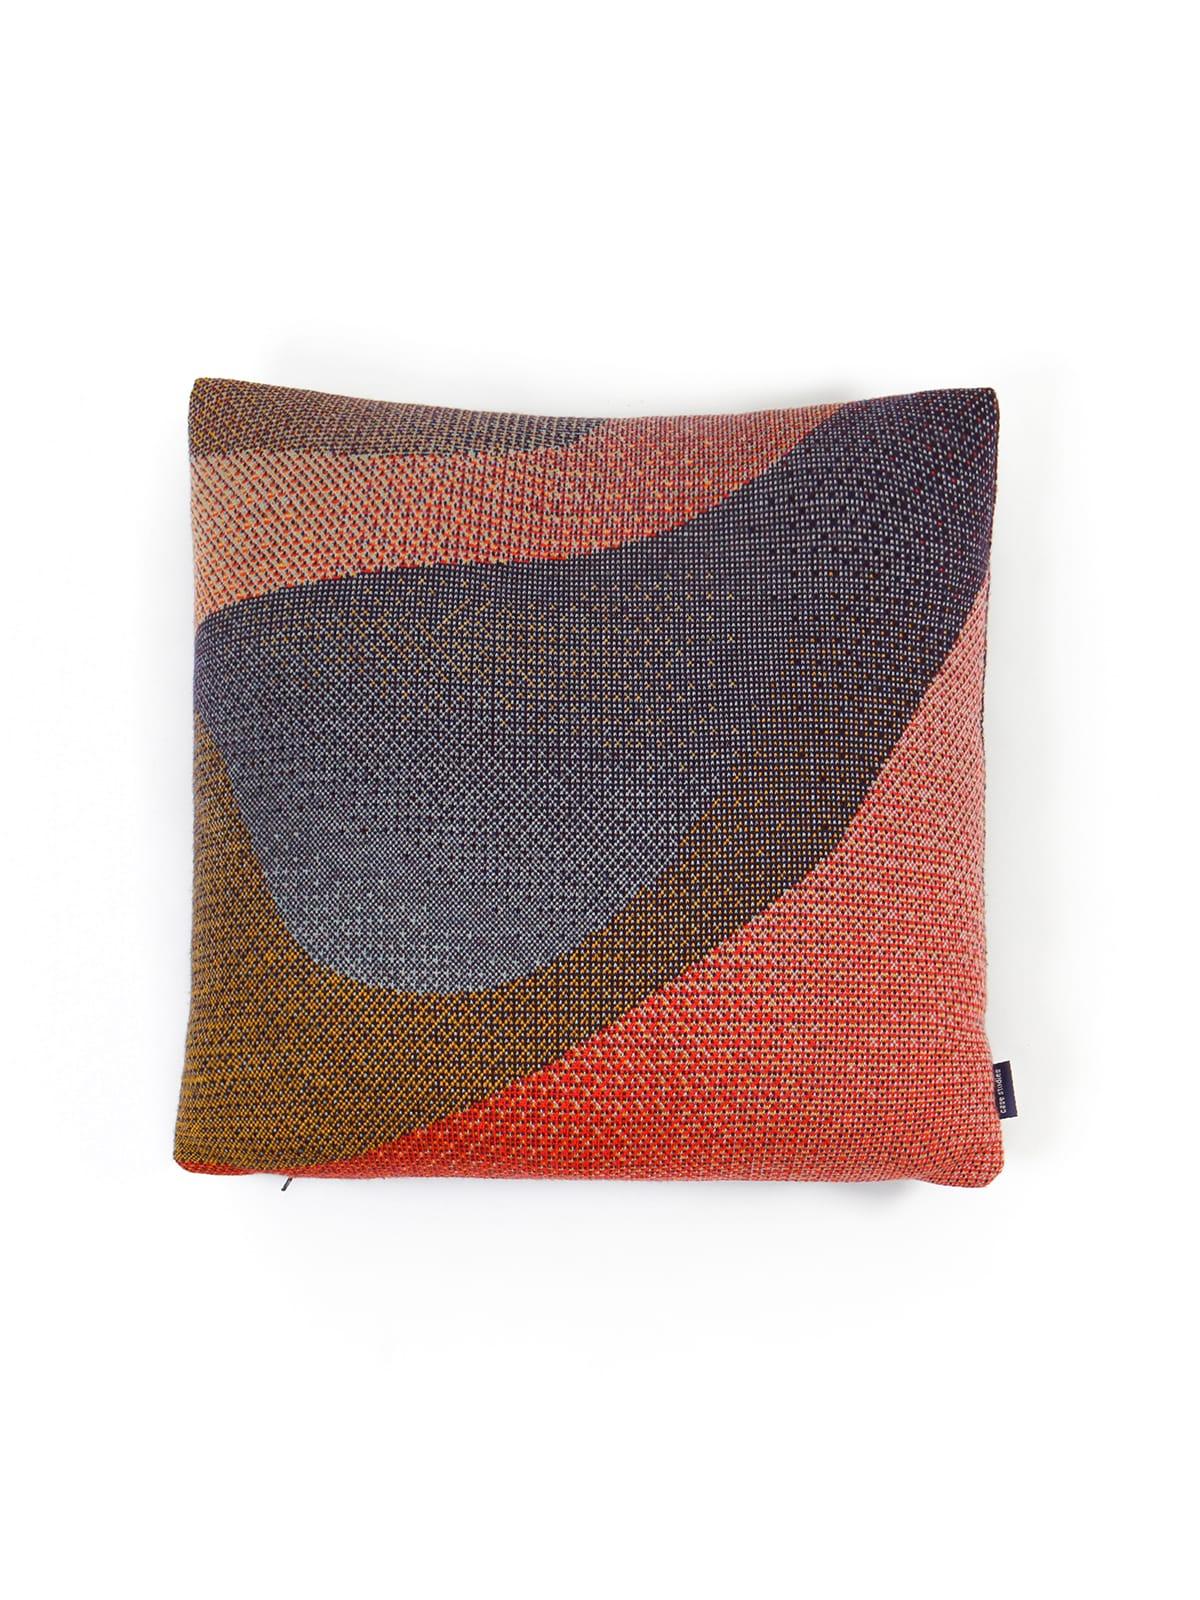 Knitted Cushion 50x50 Musselshell No2 - Merino Wool